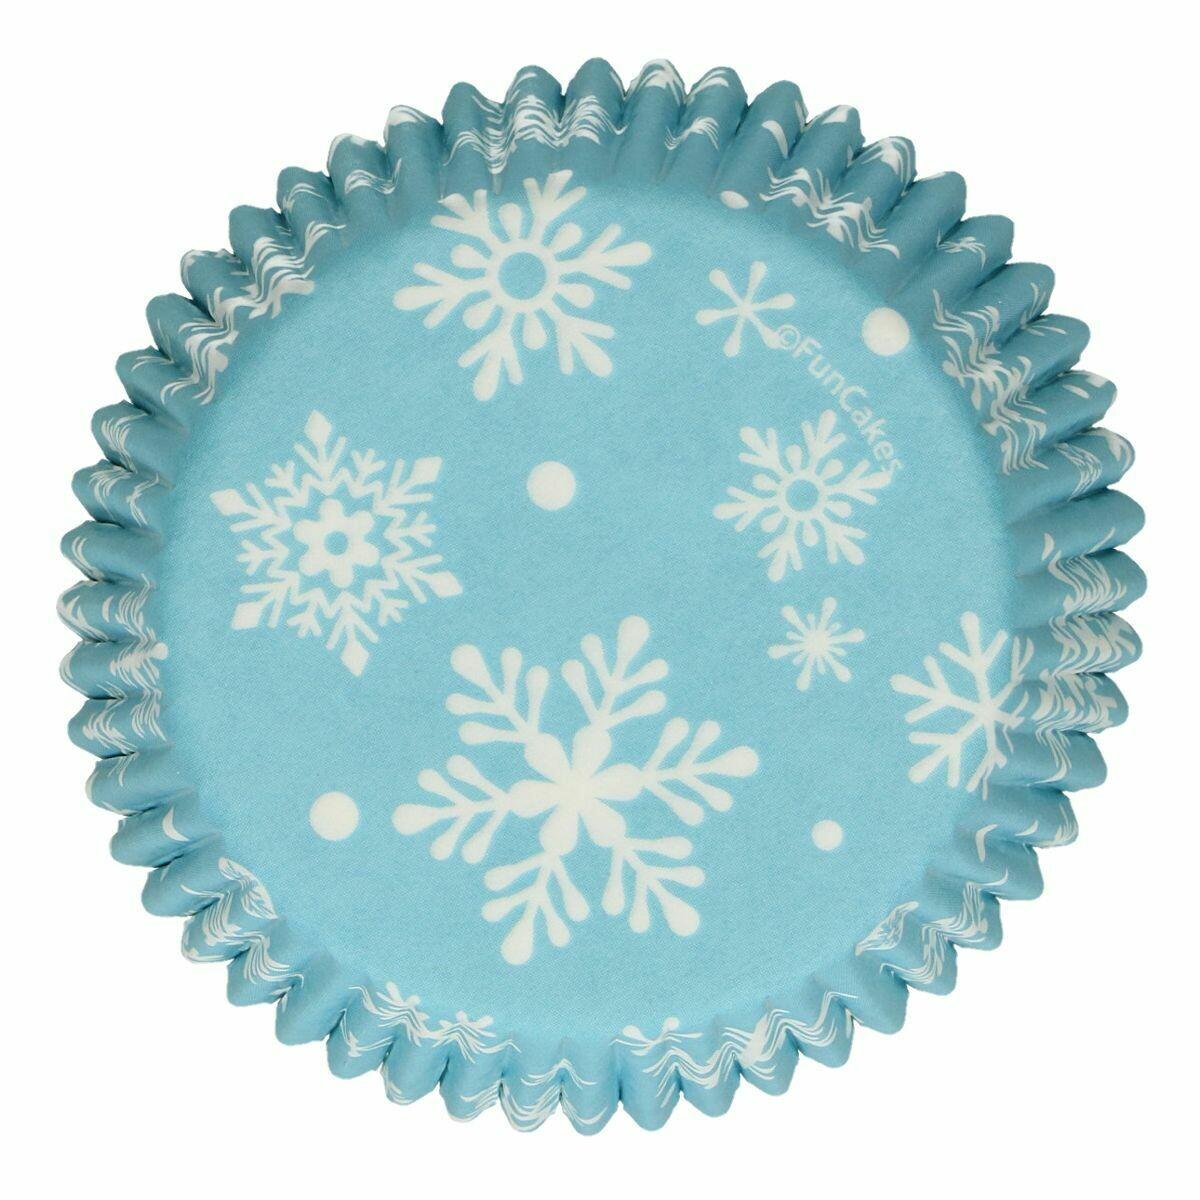 FunCakes Cupcake Cases -FROZEN SNOWFLAKES -Θήκες Ψησίματος 48 τεμ - Χειμερινό θέμα